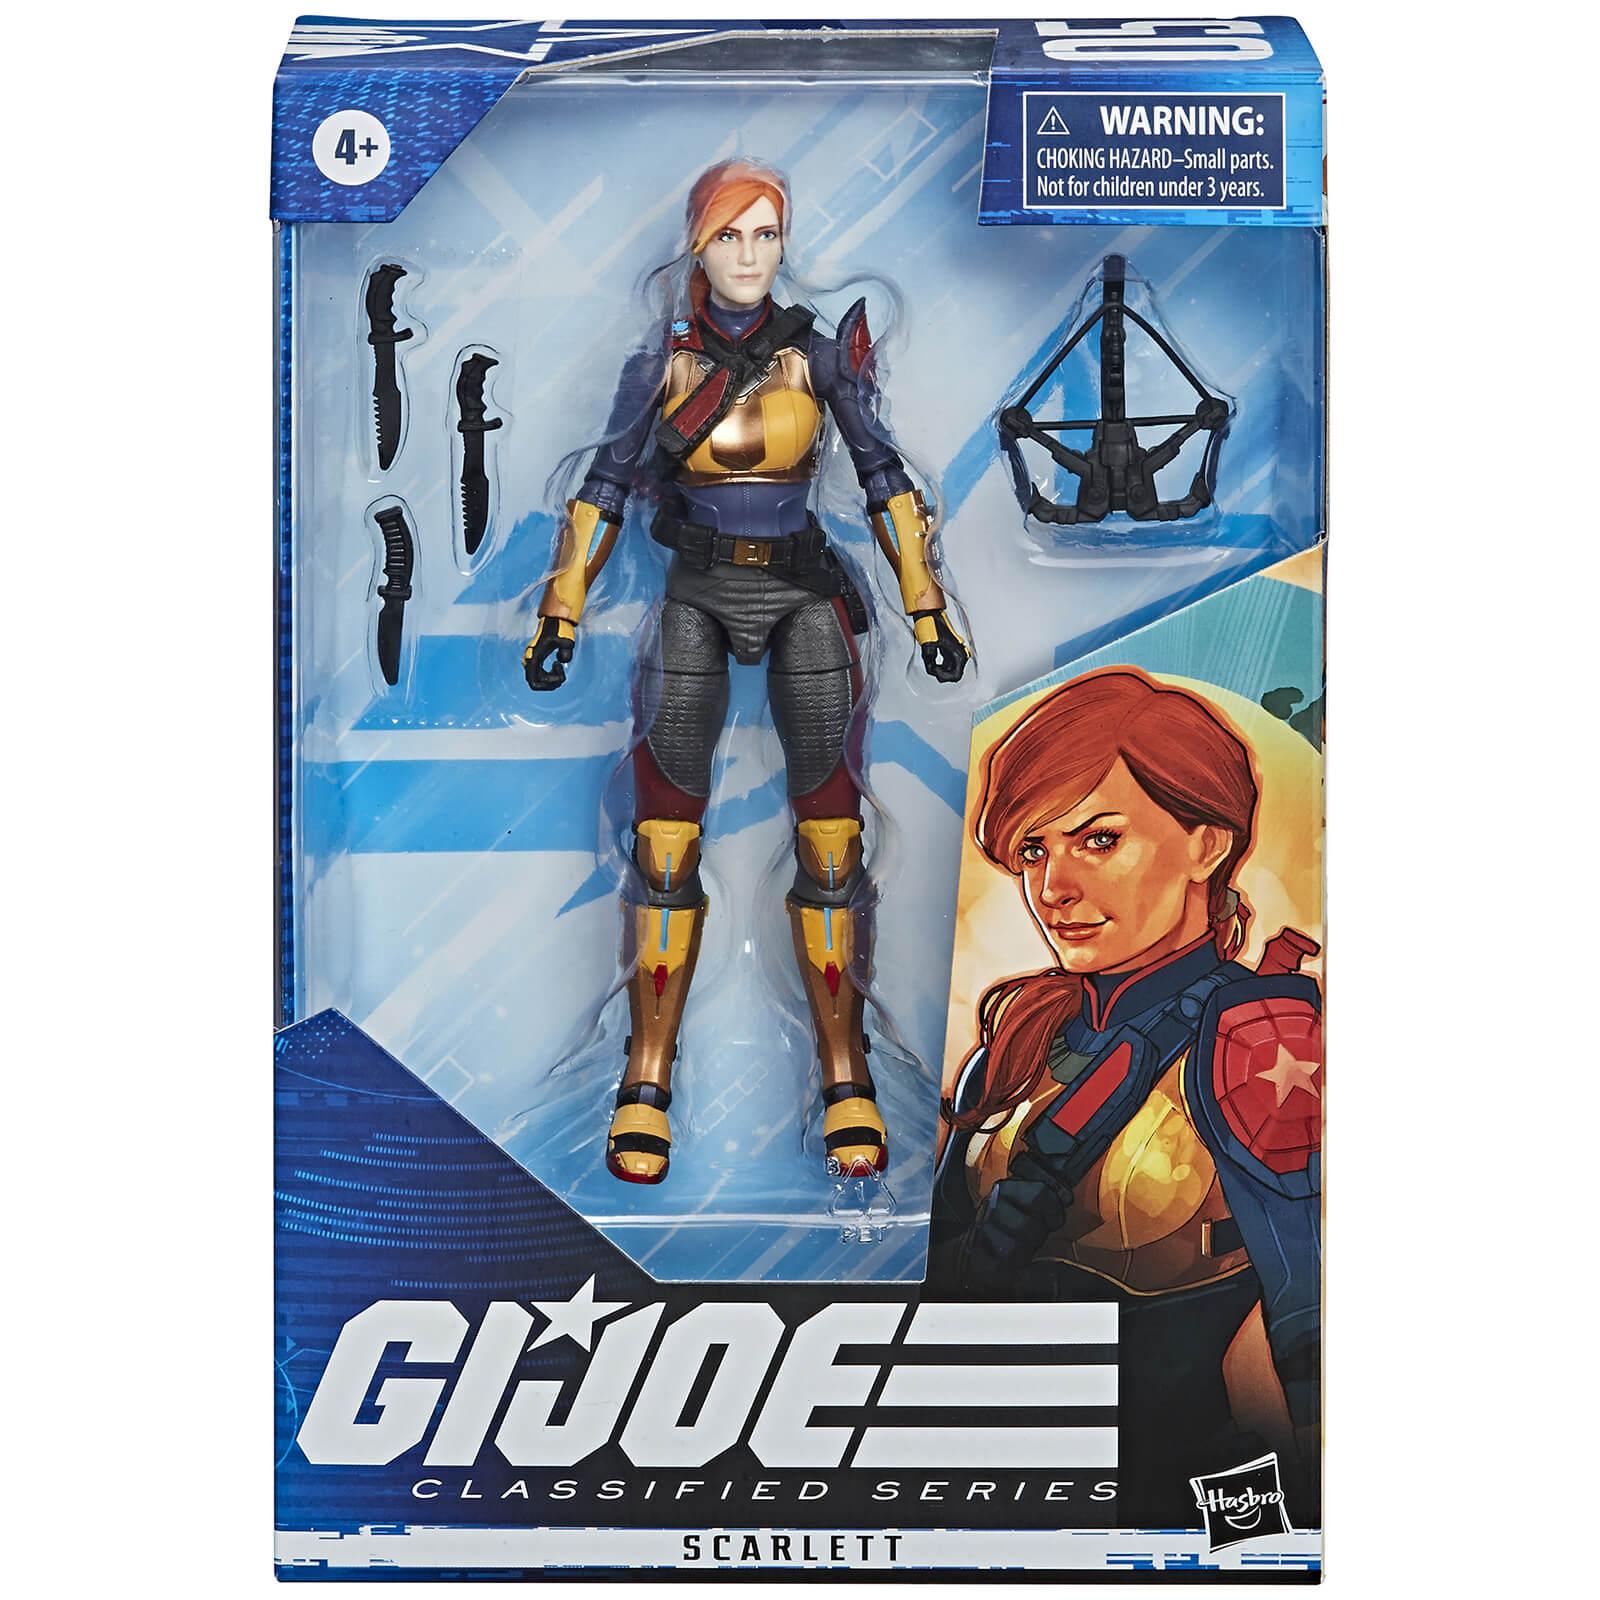 Image of Hasbro G.I. Joe Classified Series Scarlett 6-Inch Scale Action Figure 05